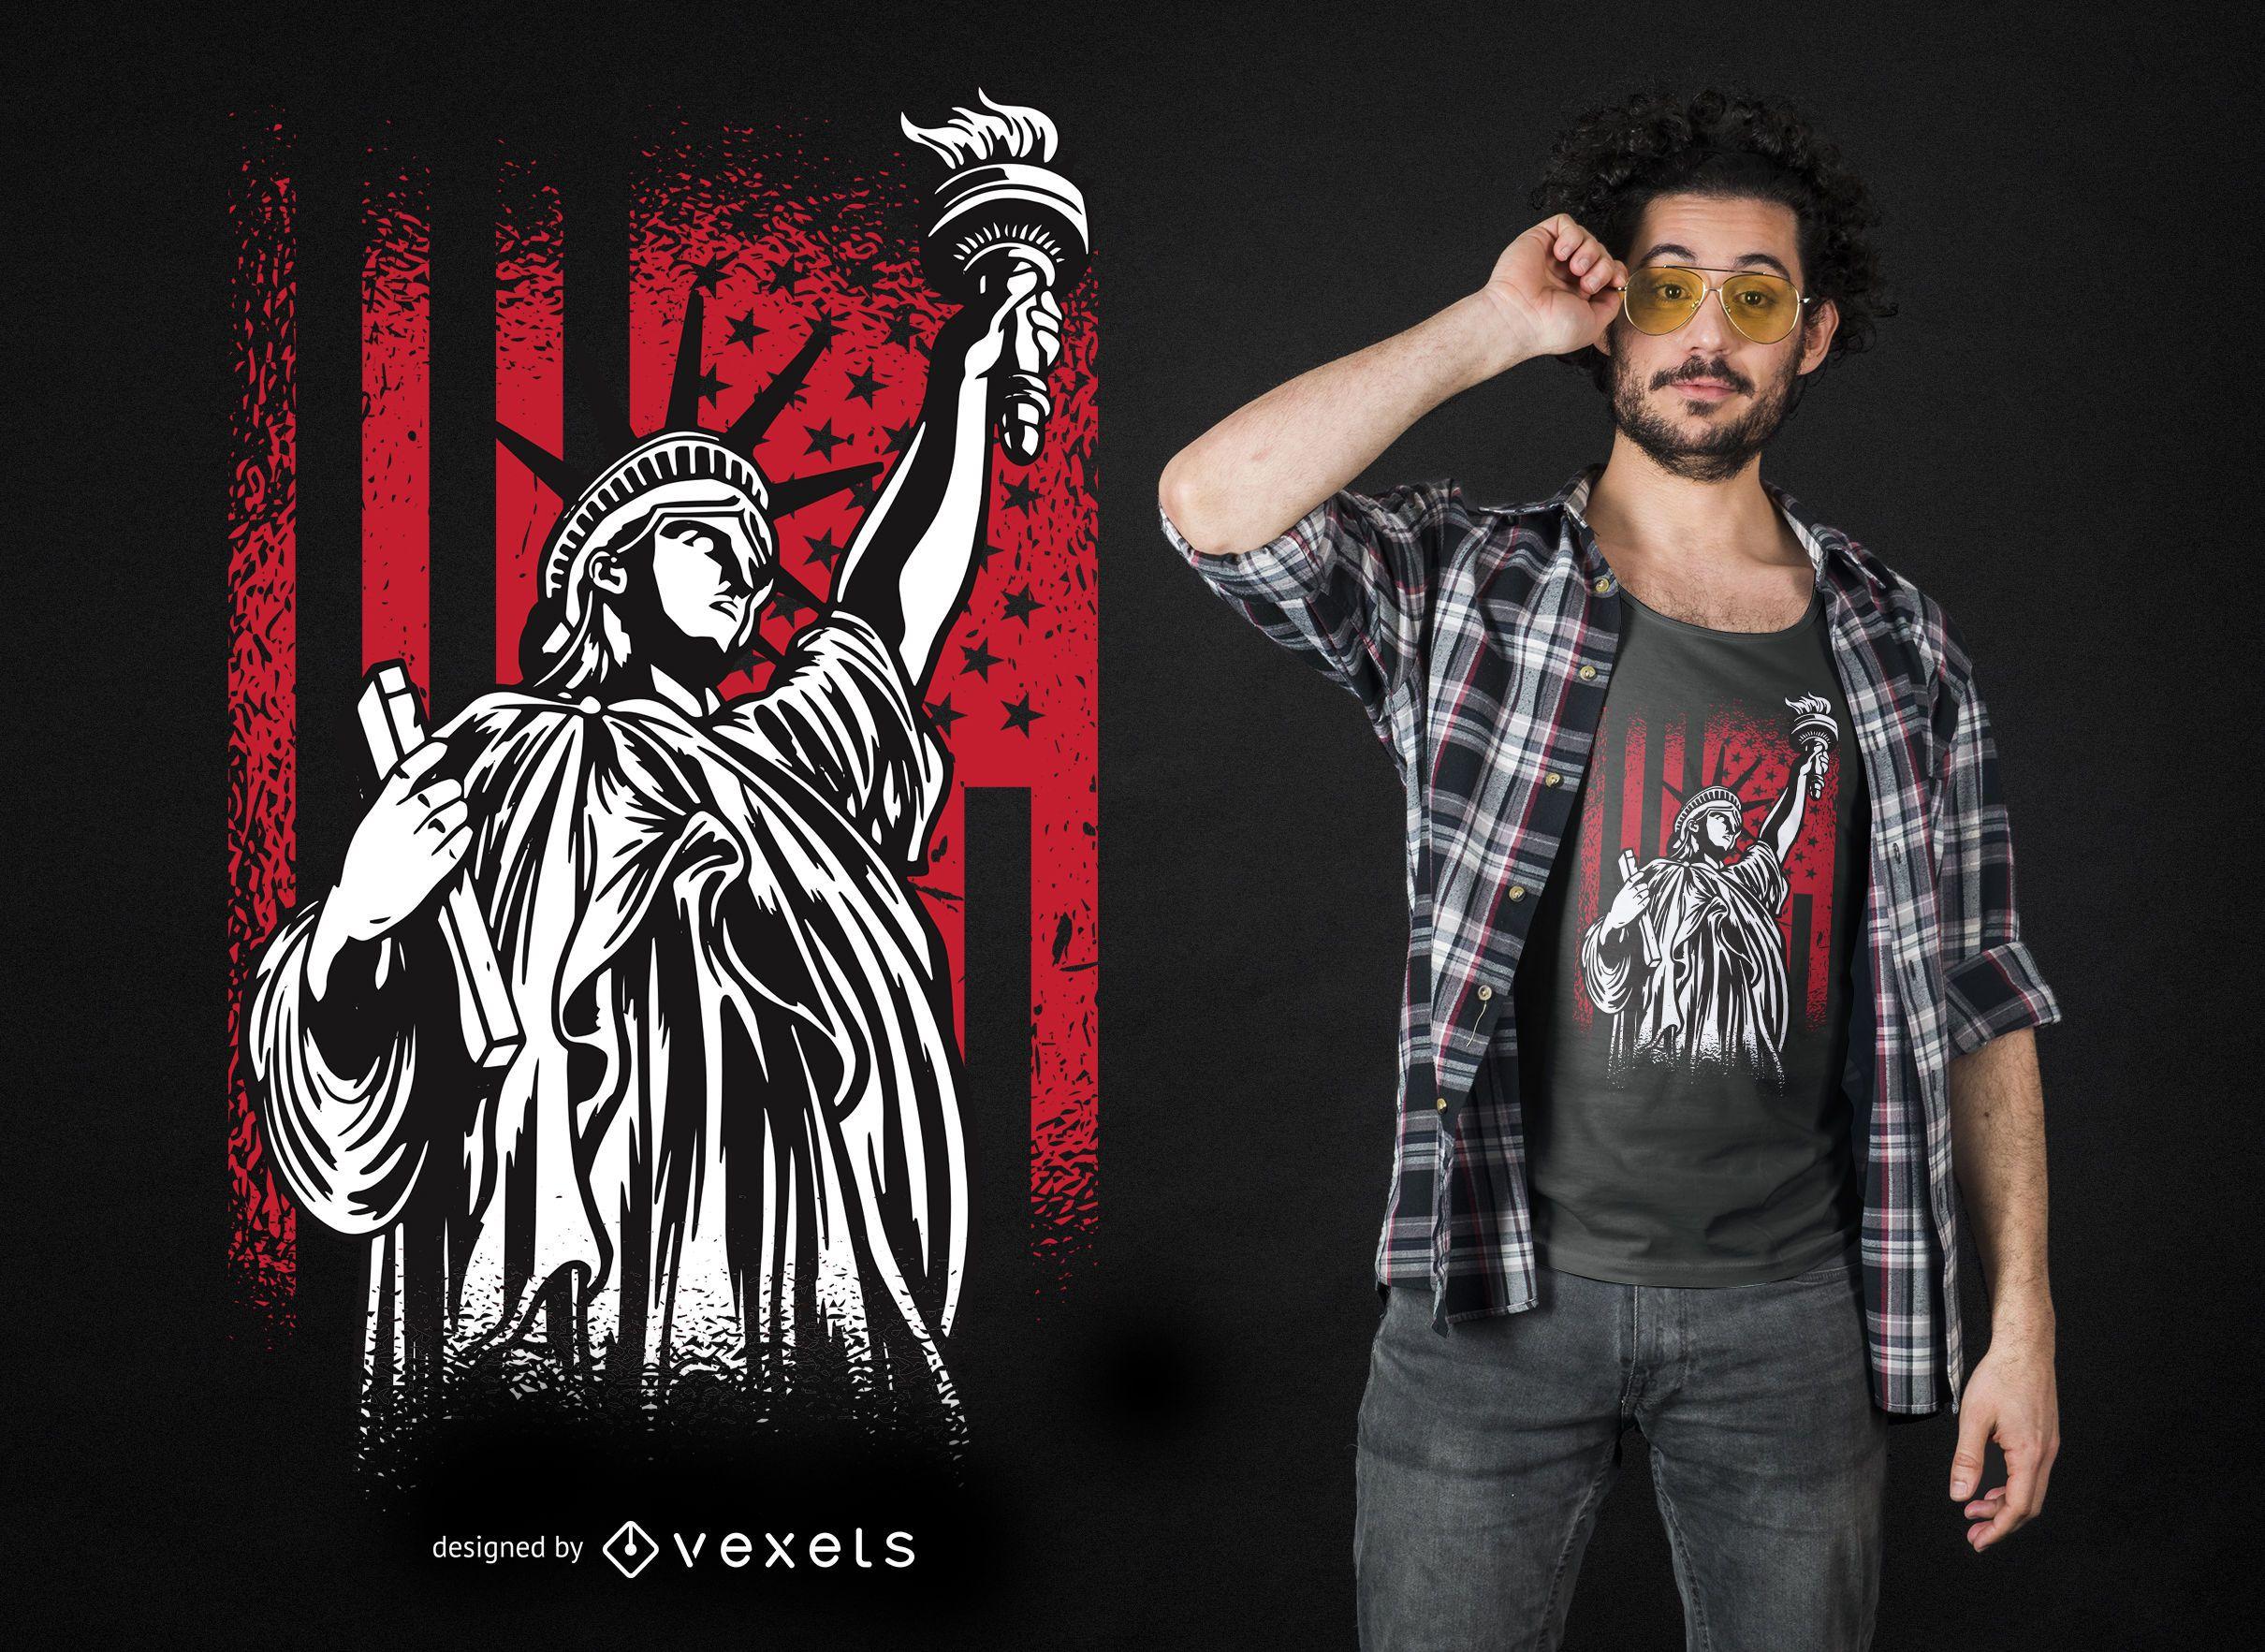 Statue of liberty usa t-shirt design